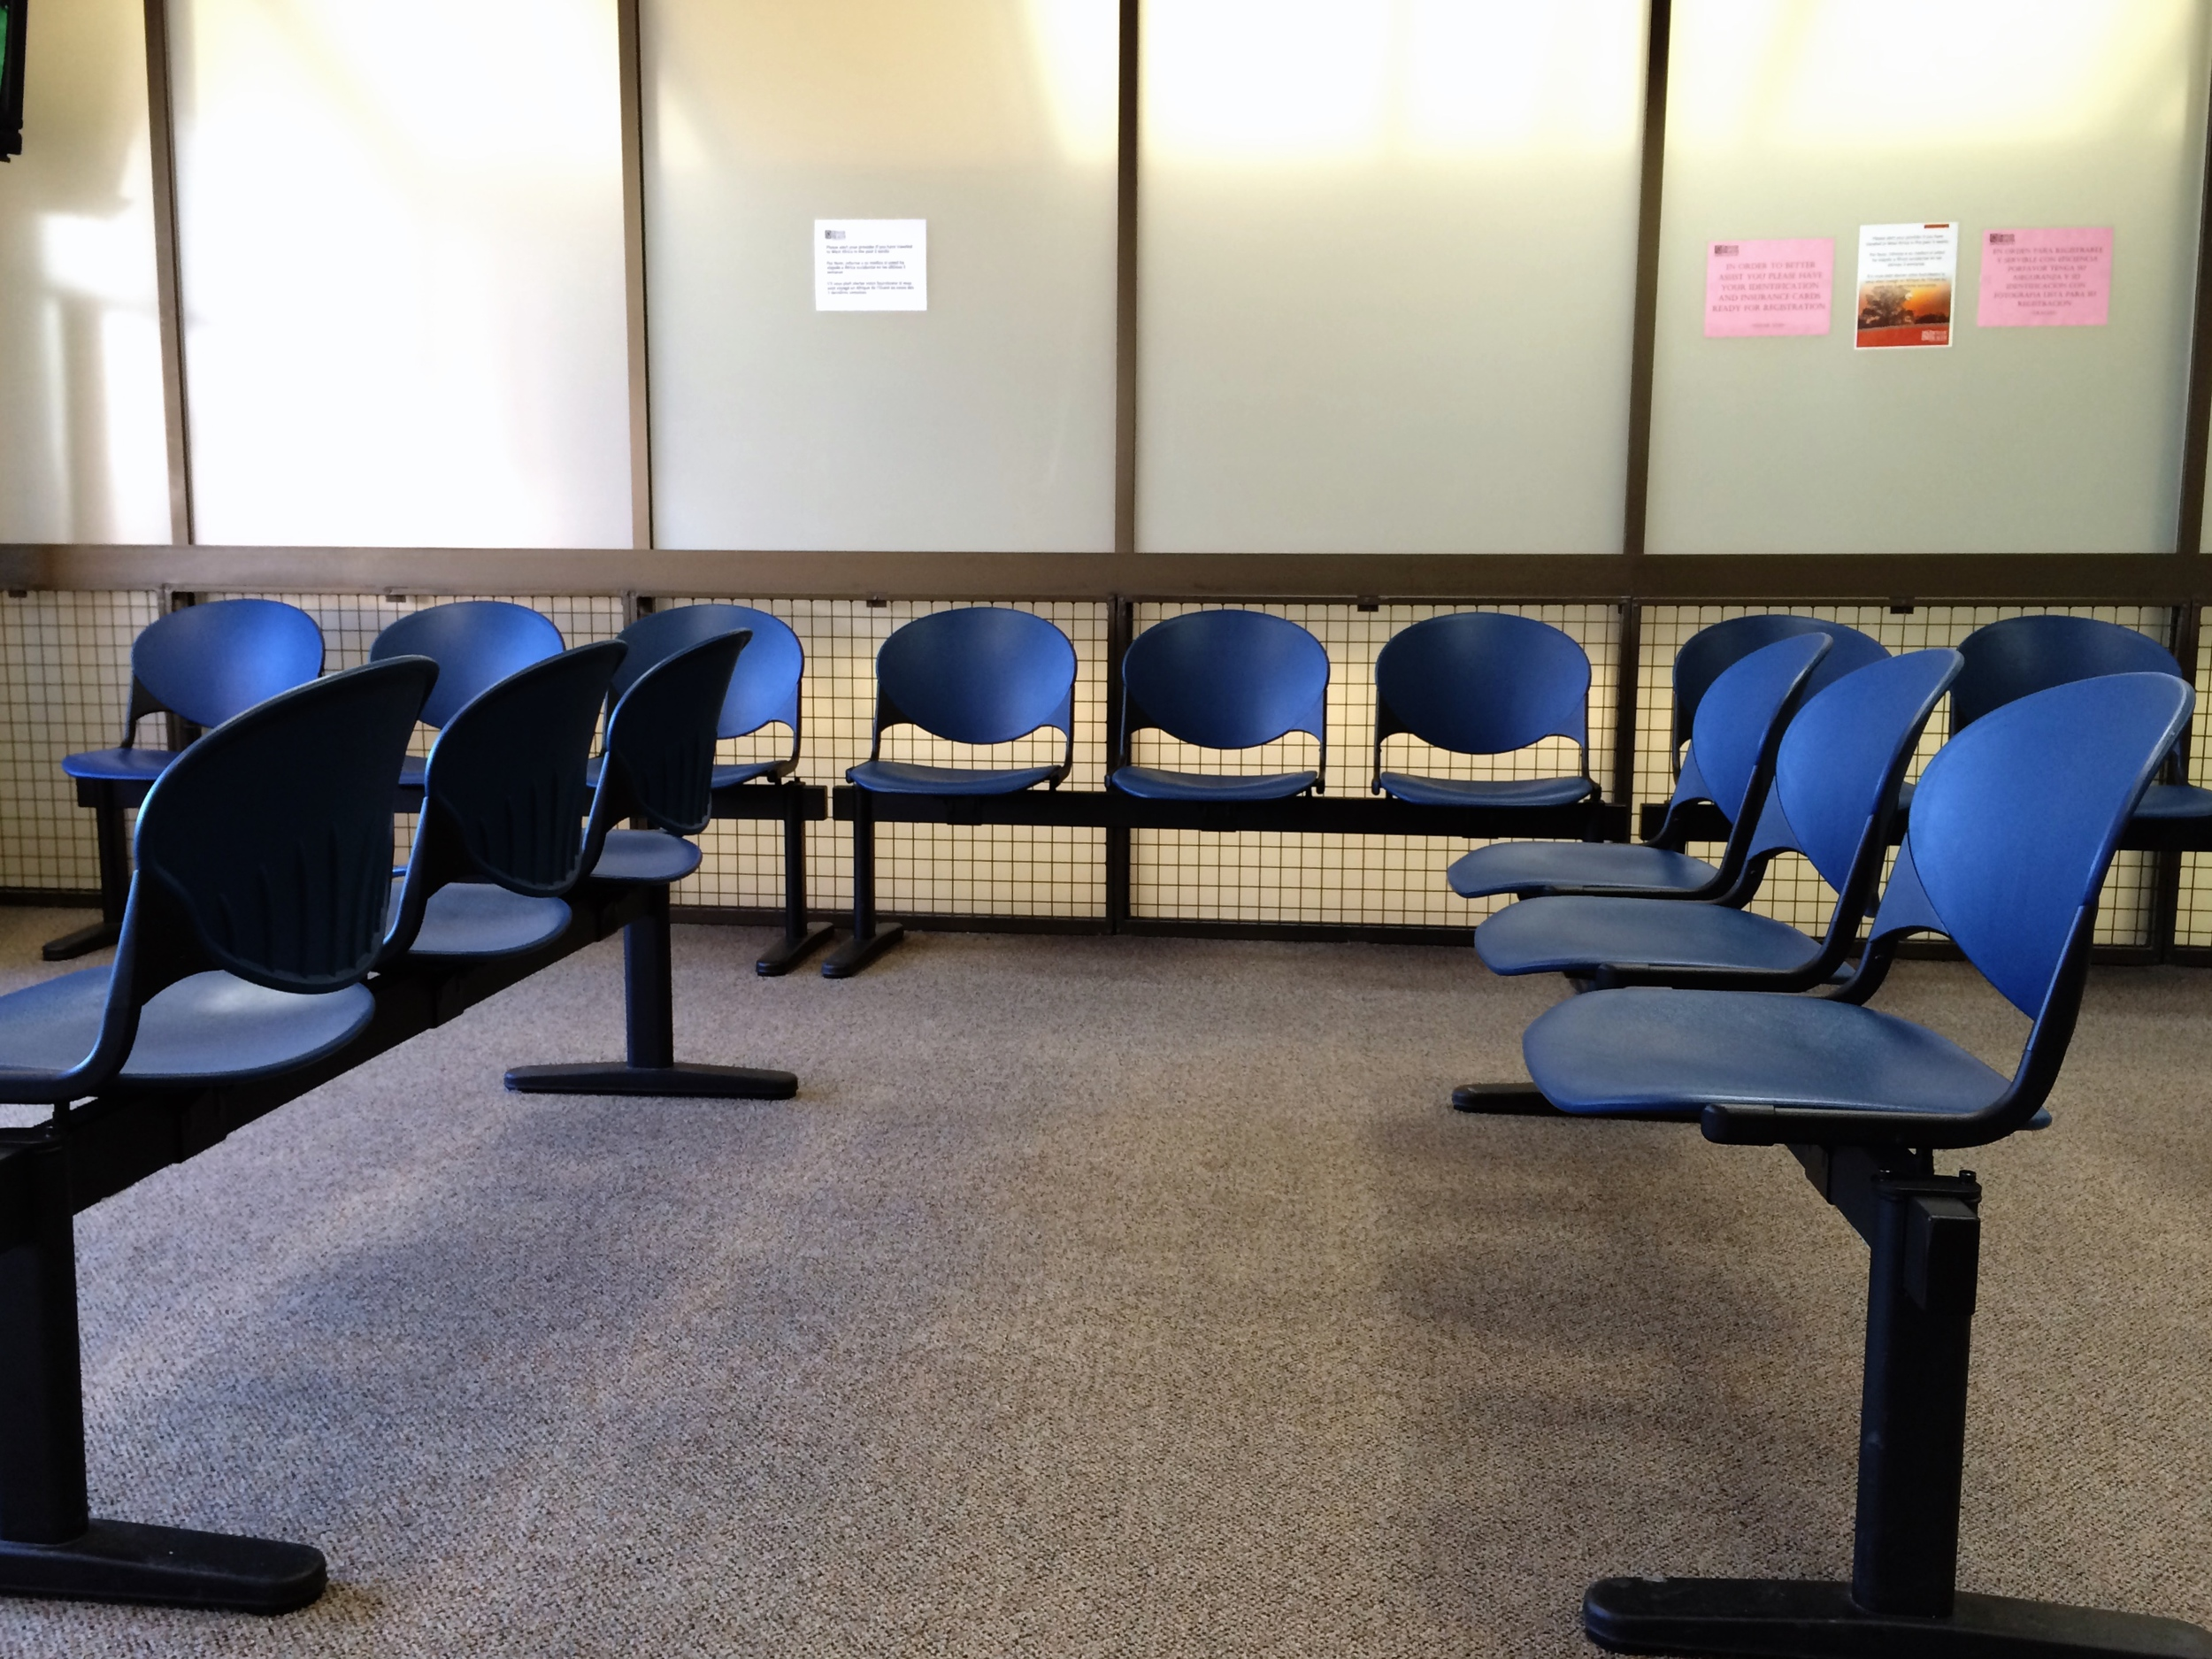 Waiting room at Denver Health